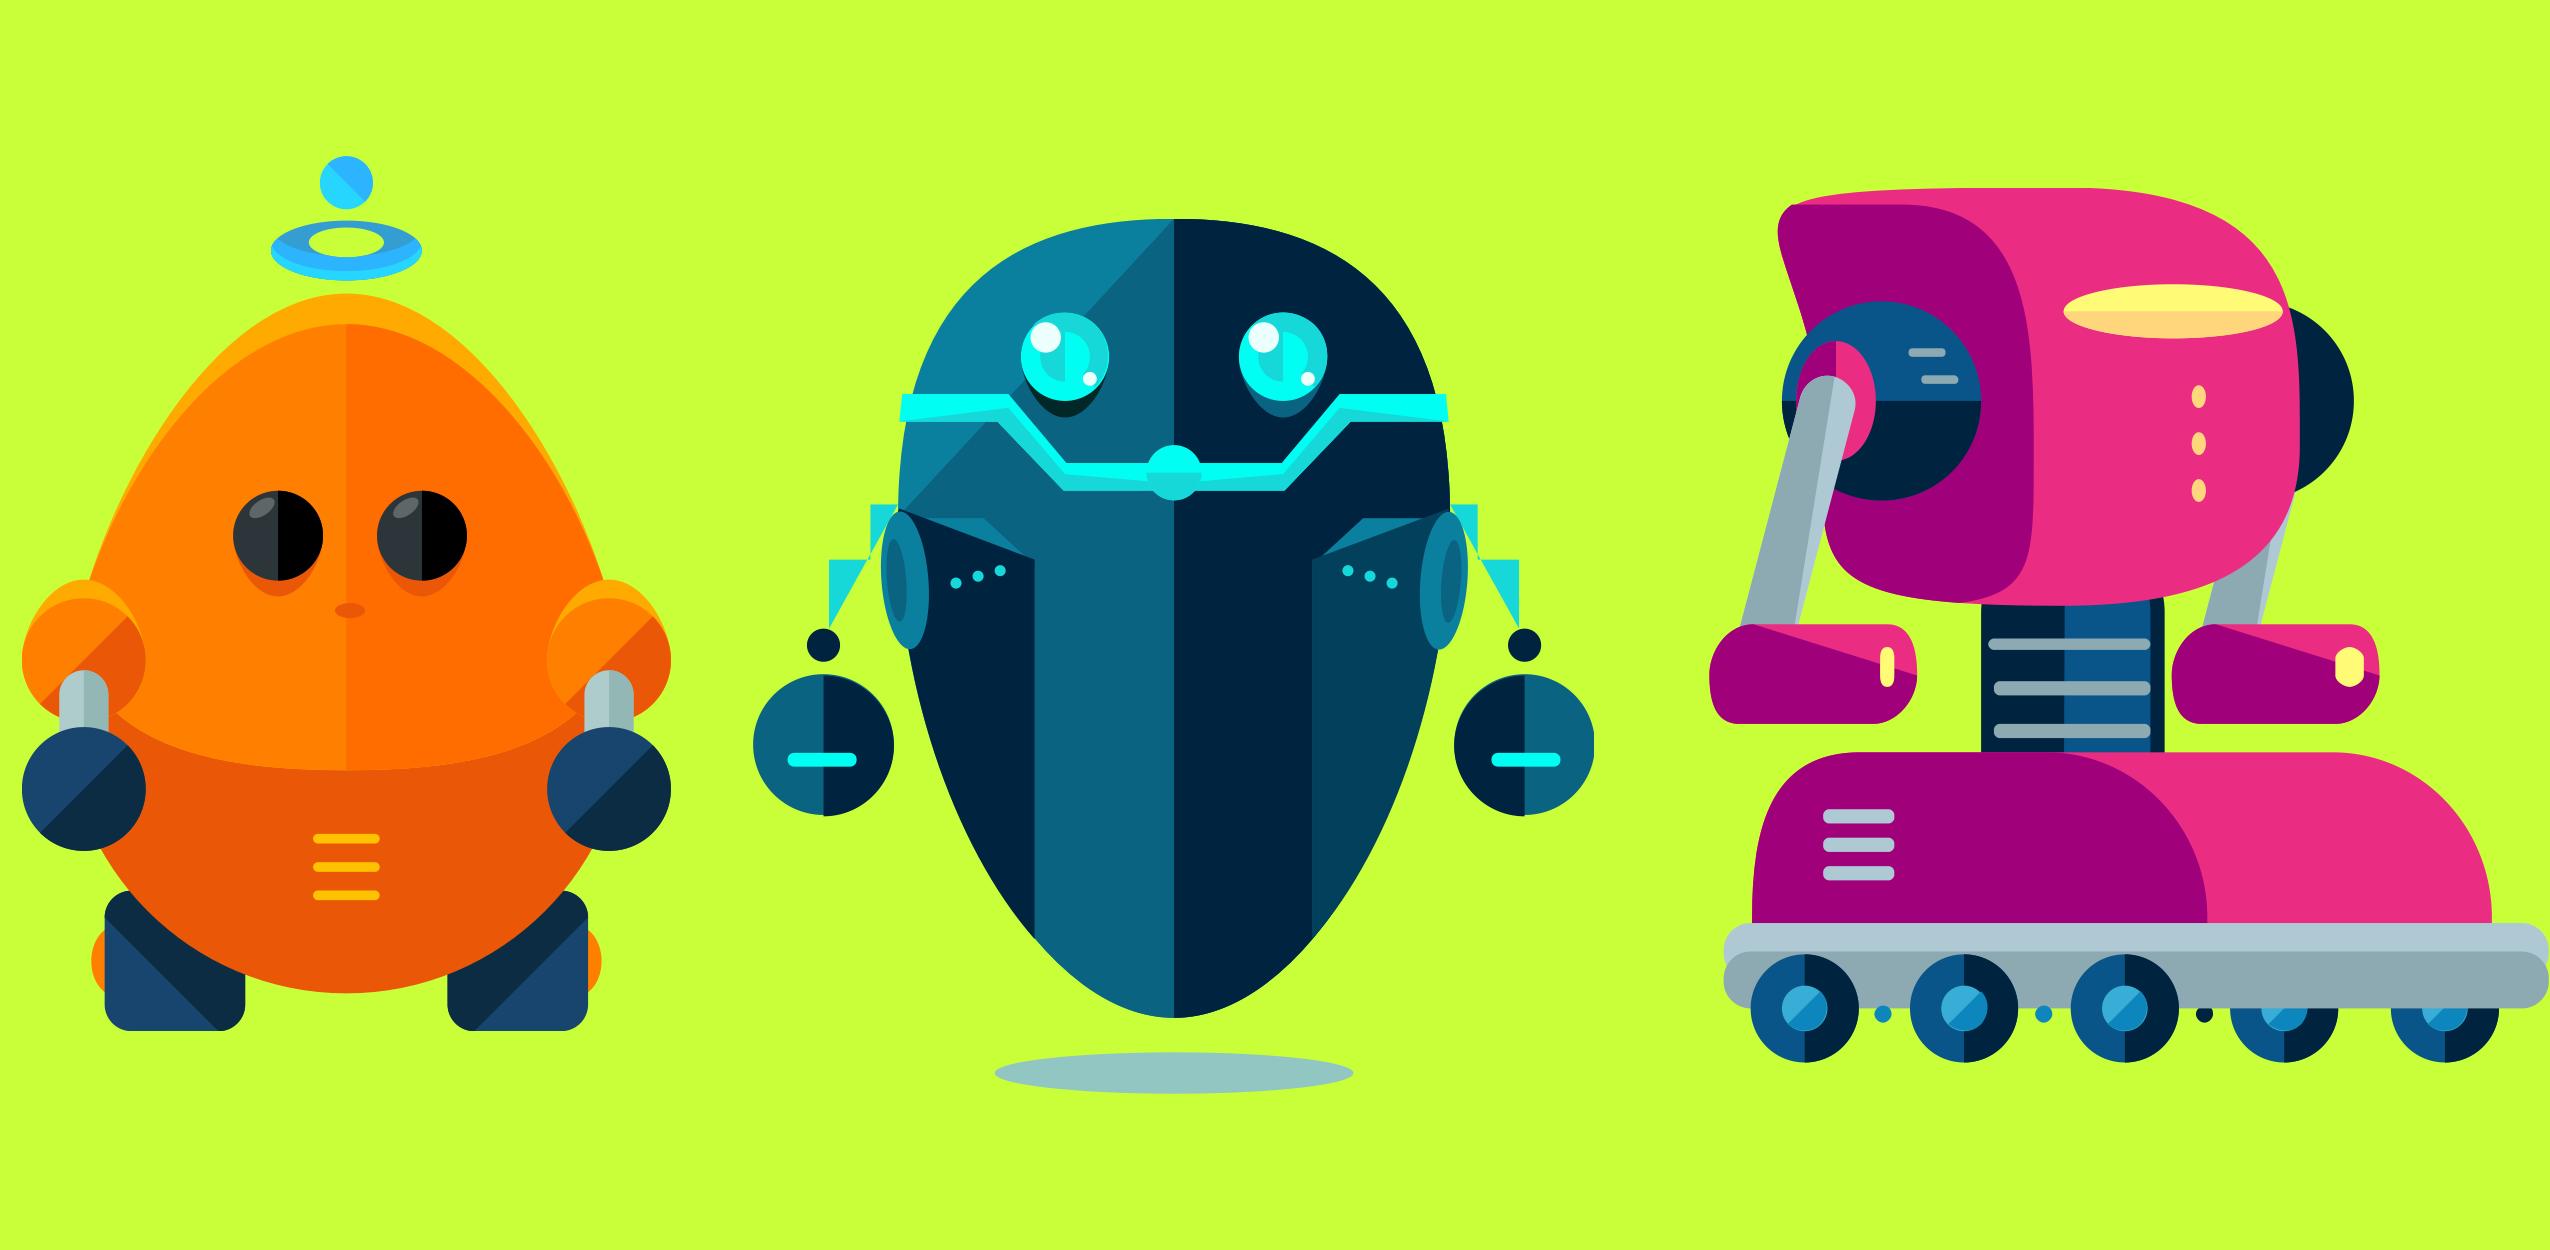 Robotic-trends-2018.png